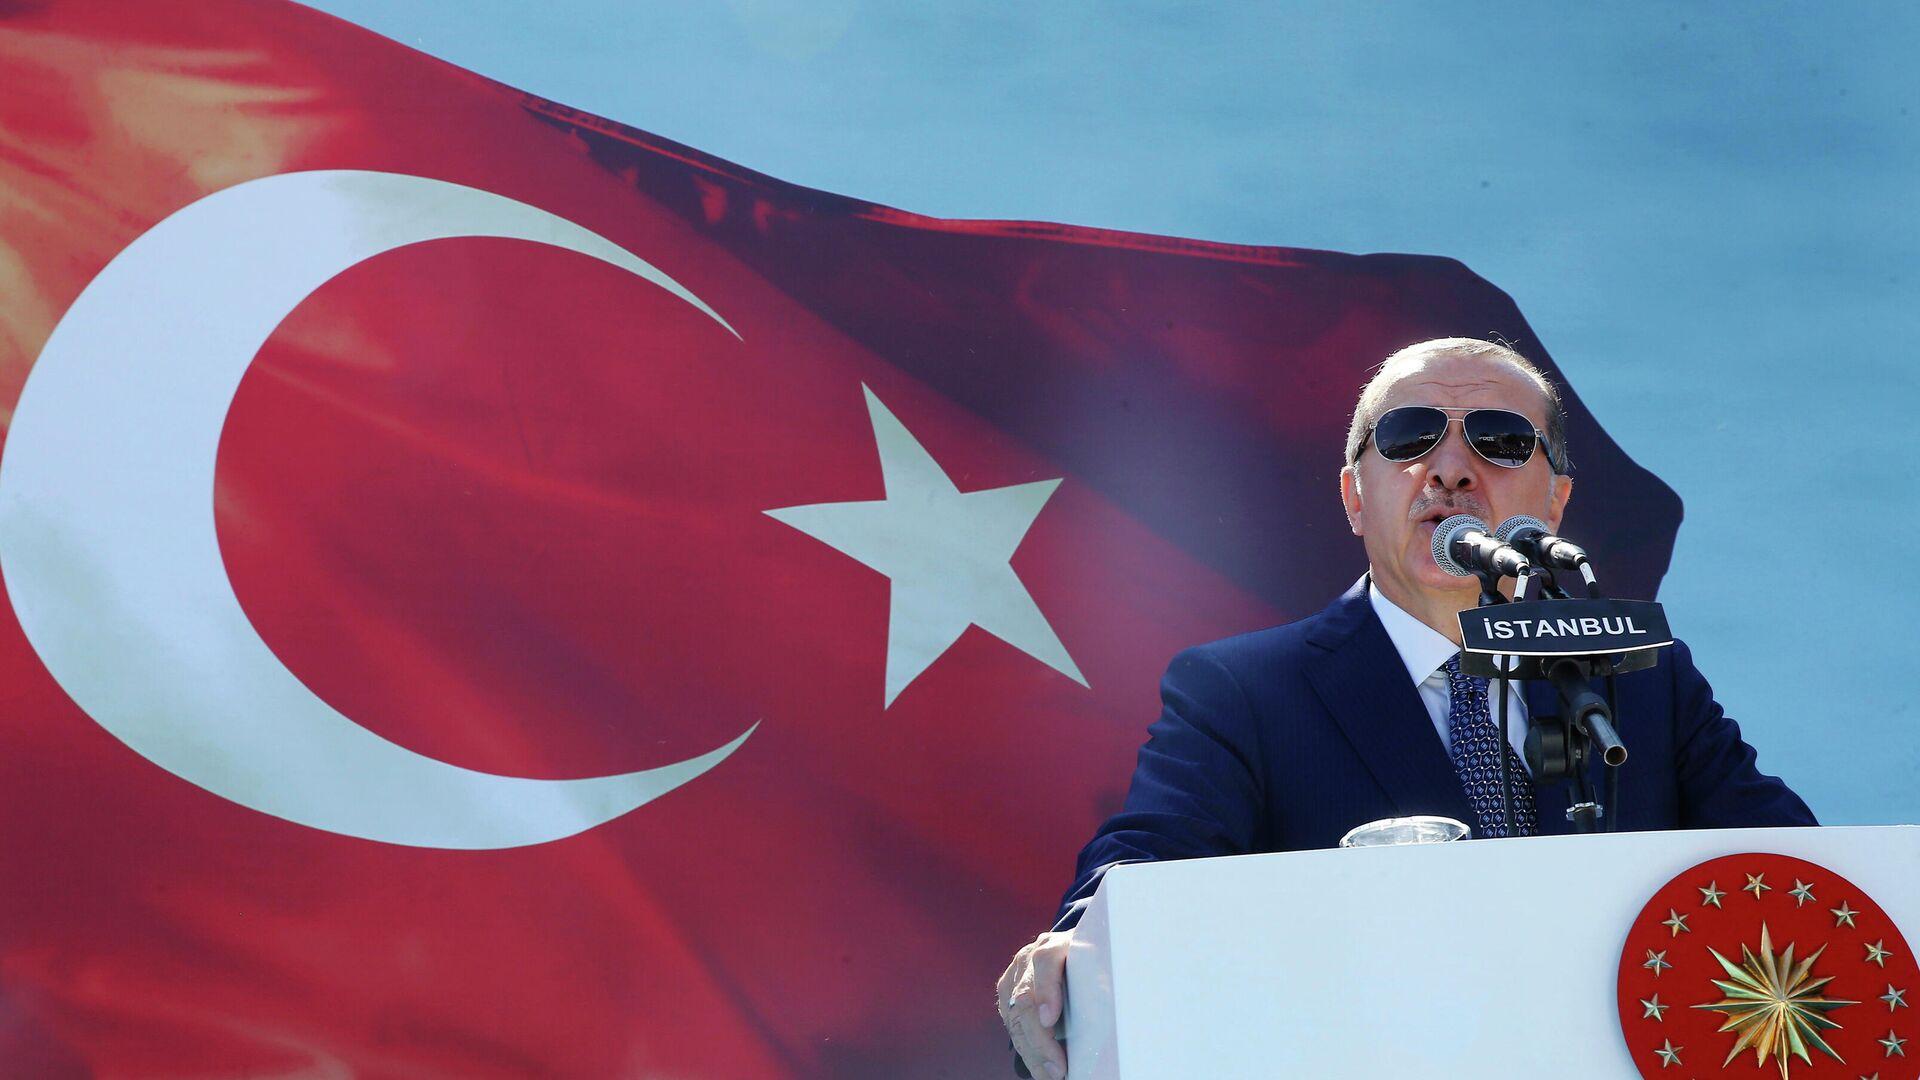 Президент Турции Реджеп Тайип Эрдоган - РИА Новости, 1920, 26.10.2020